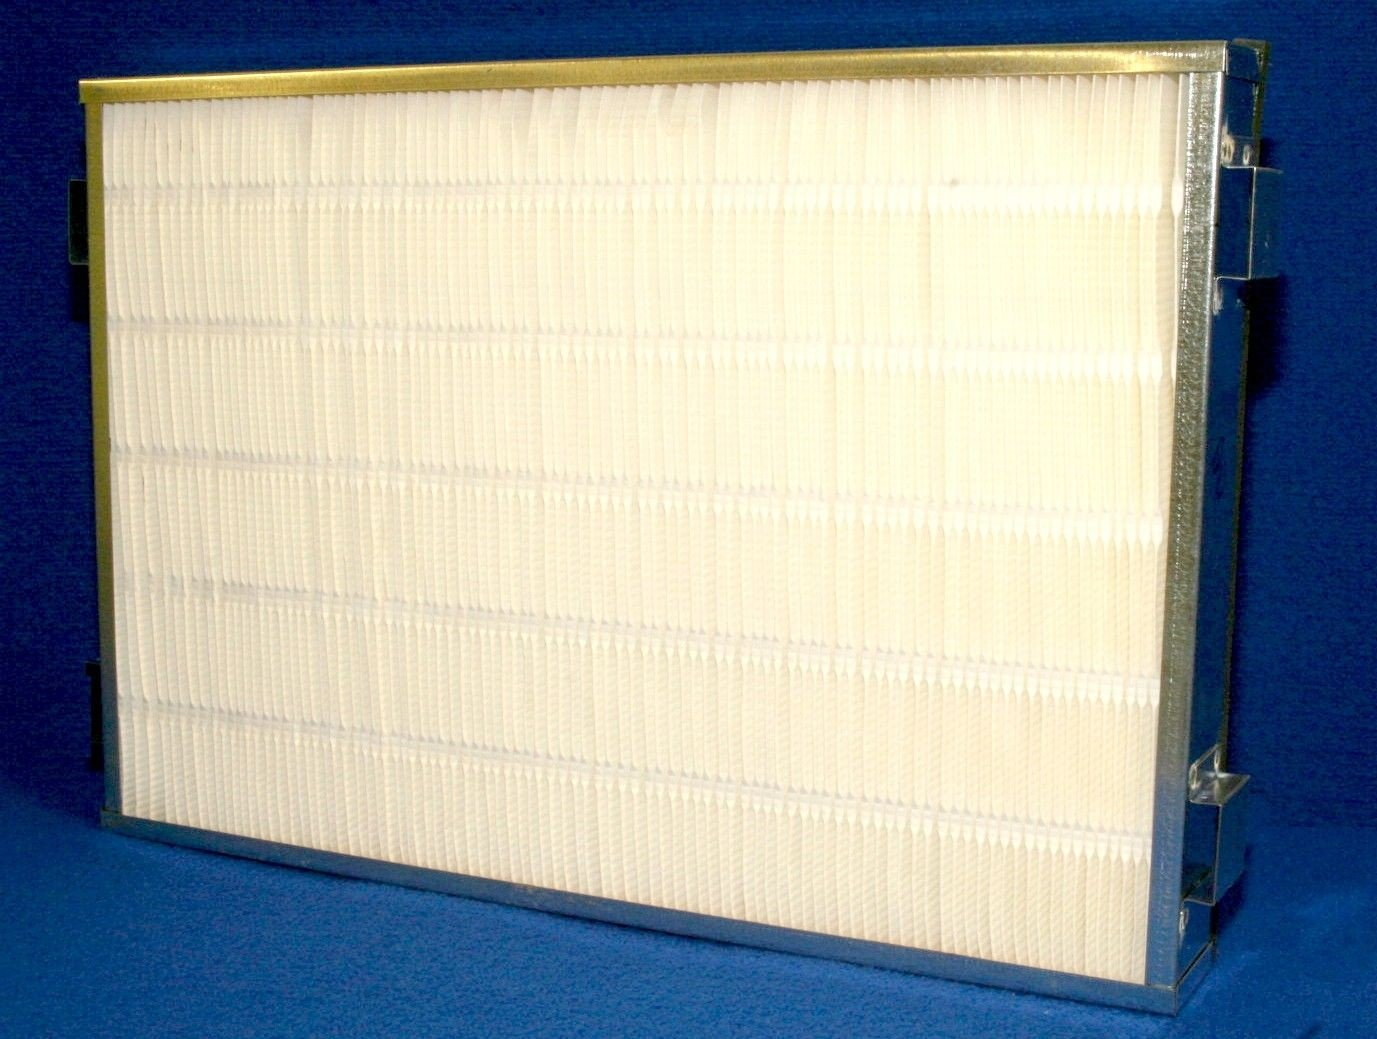 Tennant Panel Dust Air Filter 1037199AM Fits 3640 Floor Sweeper Machine by Tennant